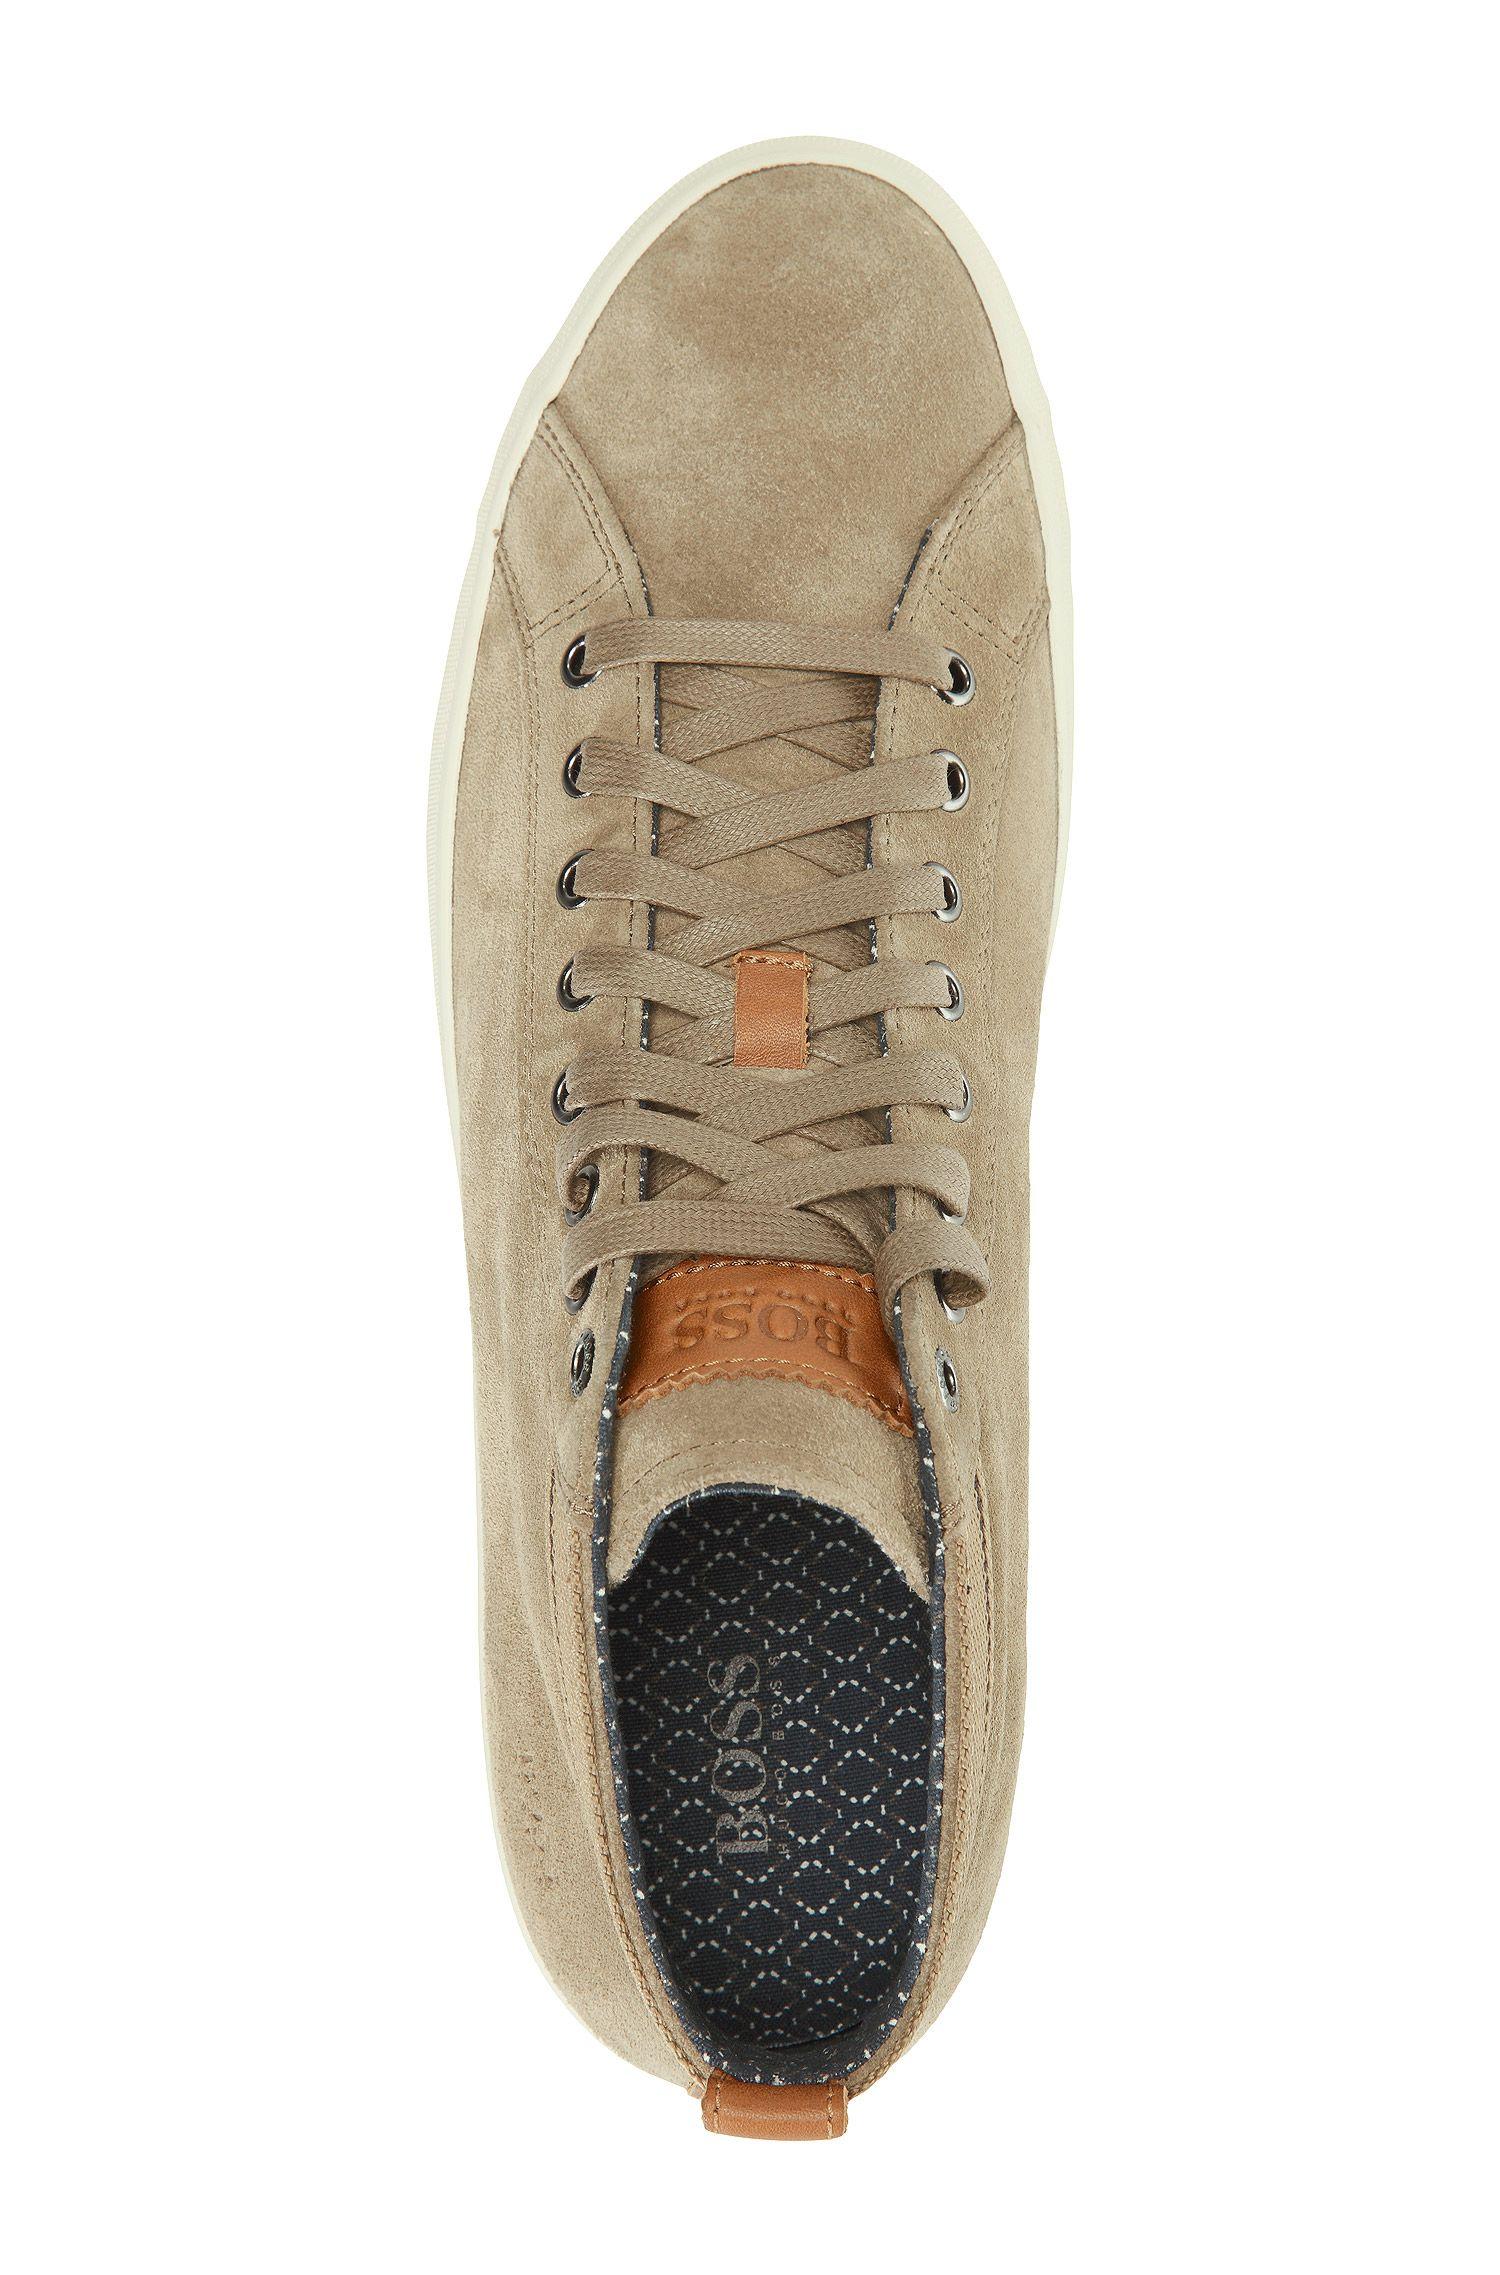 Chaussures sneaker «Bakkon» en cuir velours